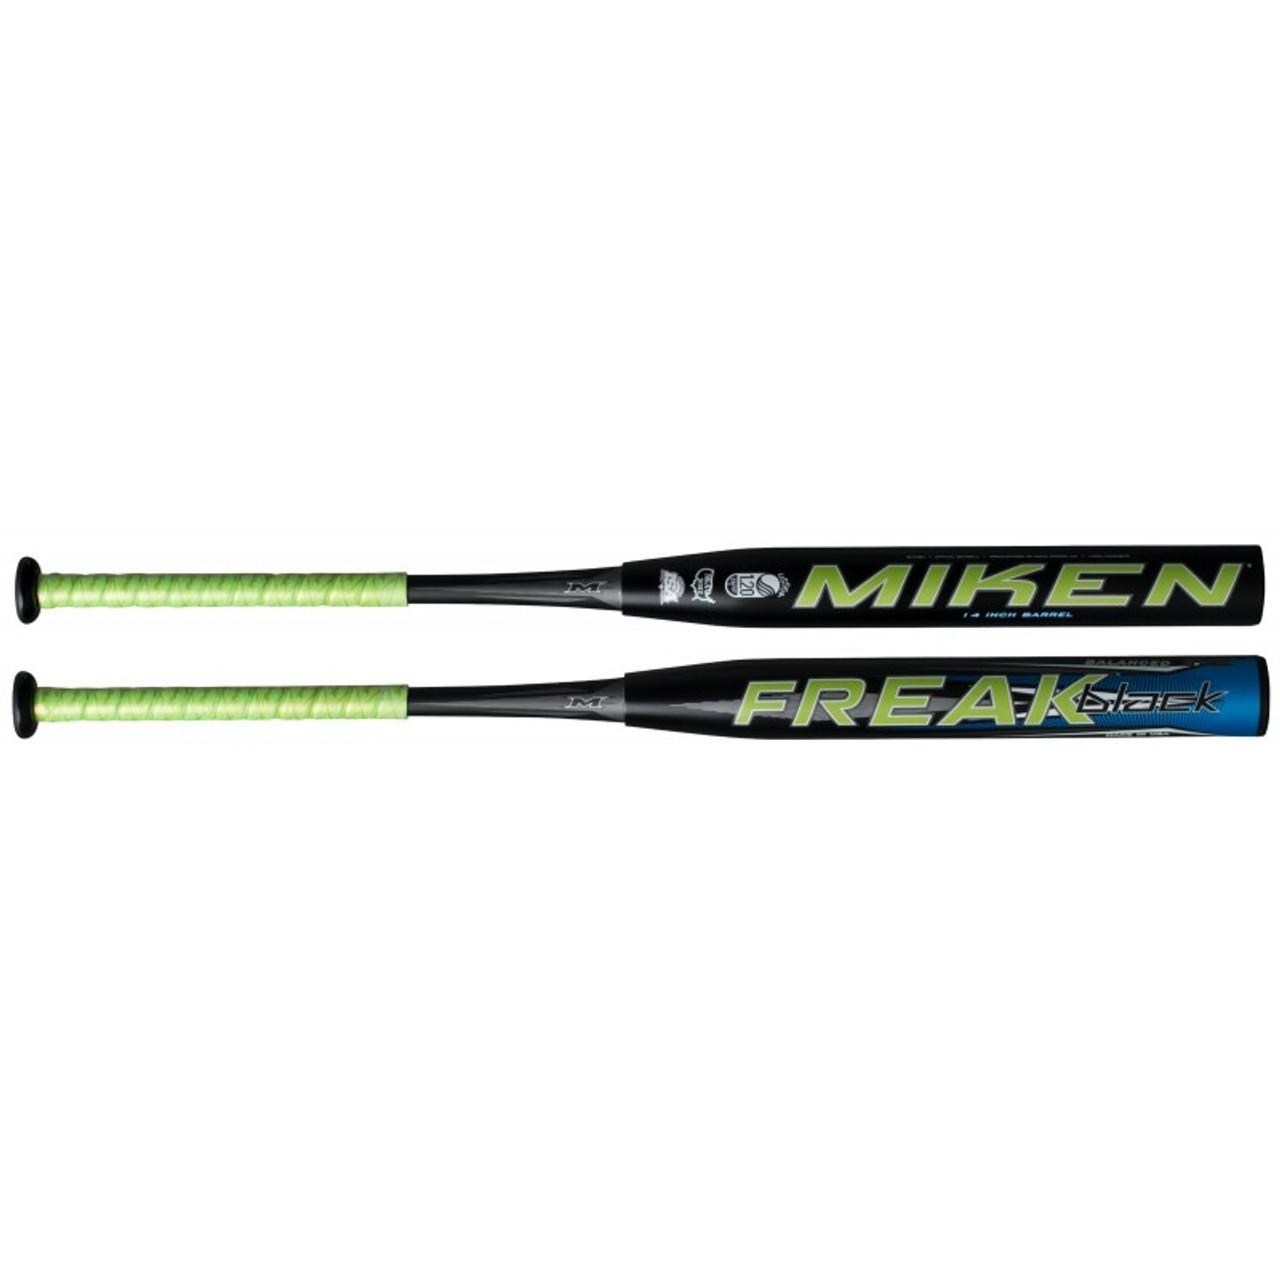 Miken 2020 Freak PRIMO Balanced USSSA Slowpitch Softball Bat 28 oz 14 inch Barrel Length